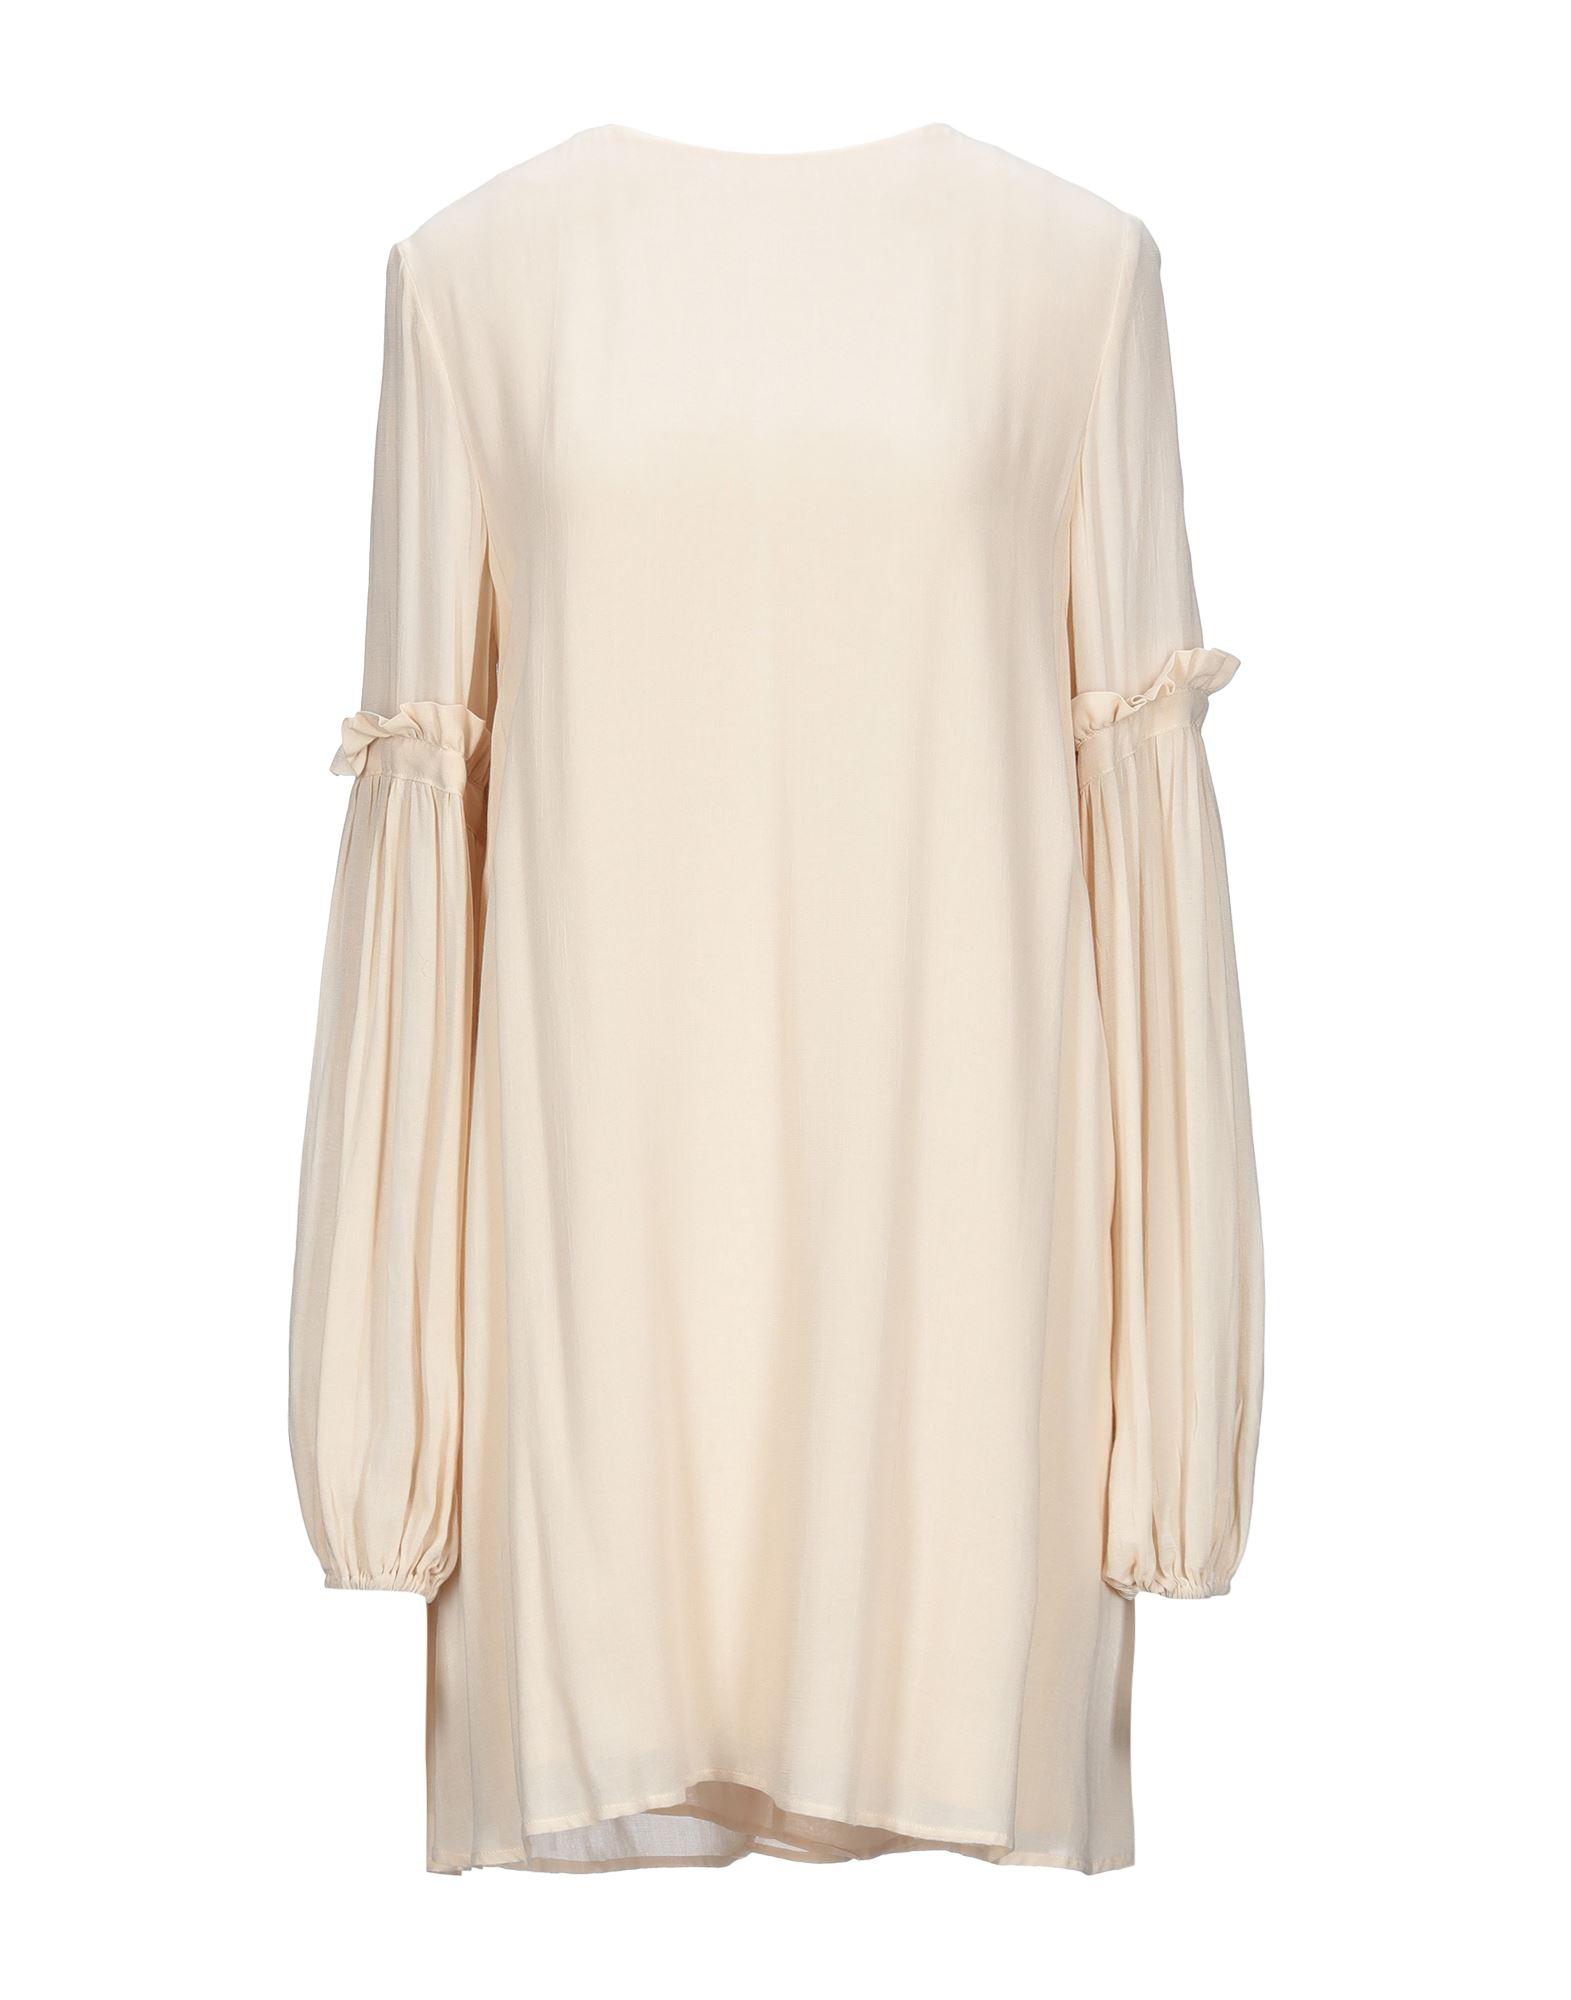 Фото - MARGAUX LONNBERG Короткое платье margaux lonnberg топ без рукавов